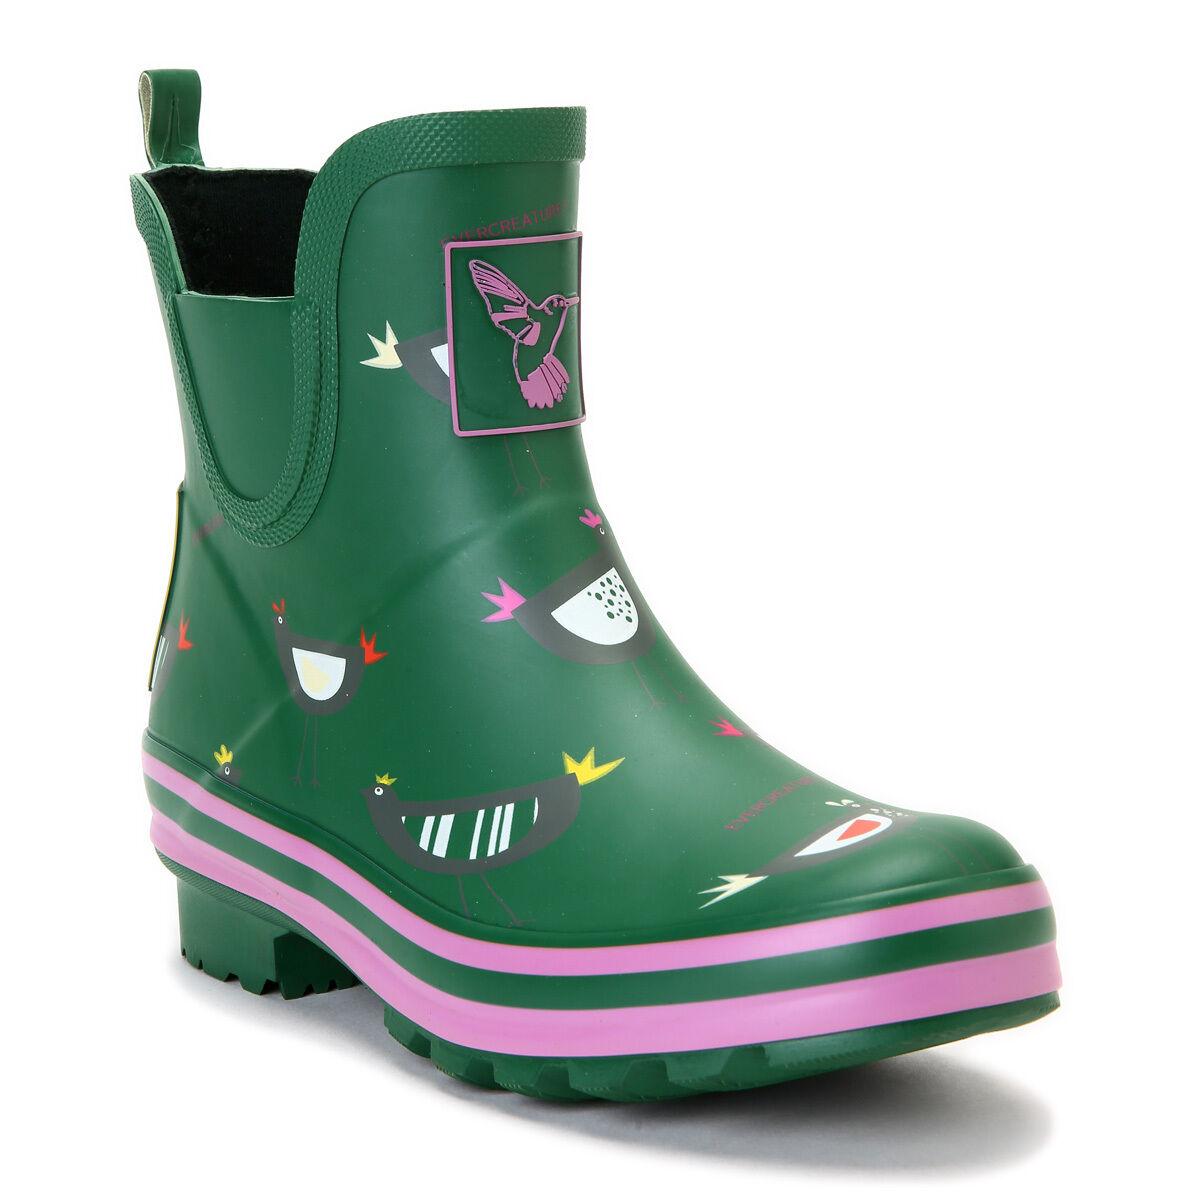 Women's Ankle-high Waterproof Rain Boot Cute animal print Rain Boots Wellies